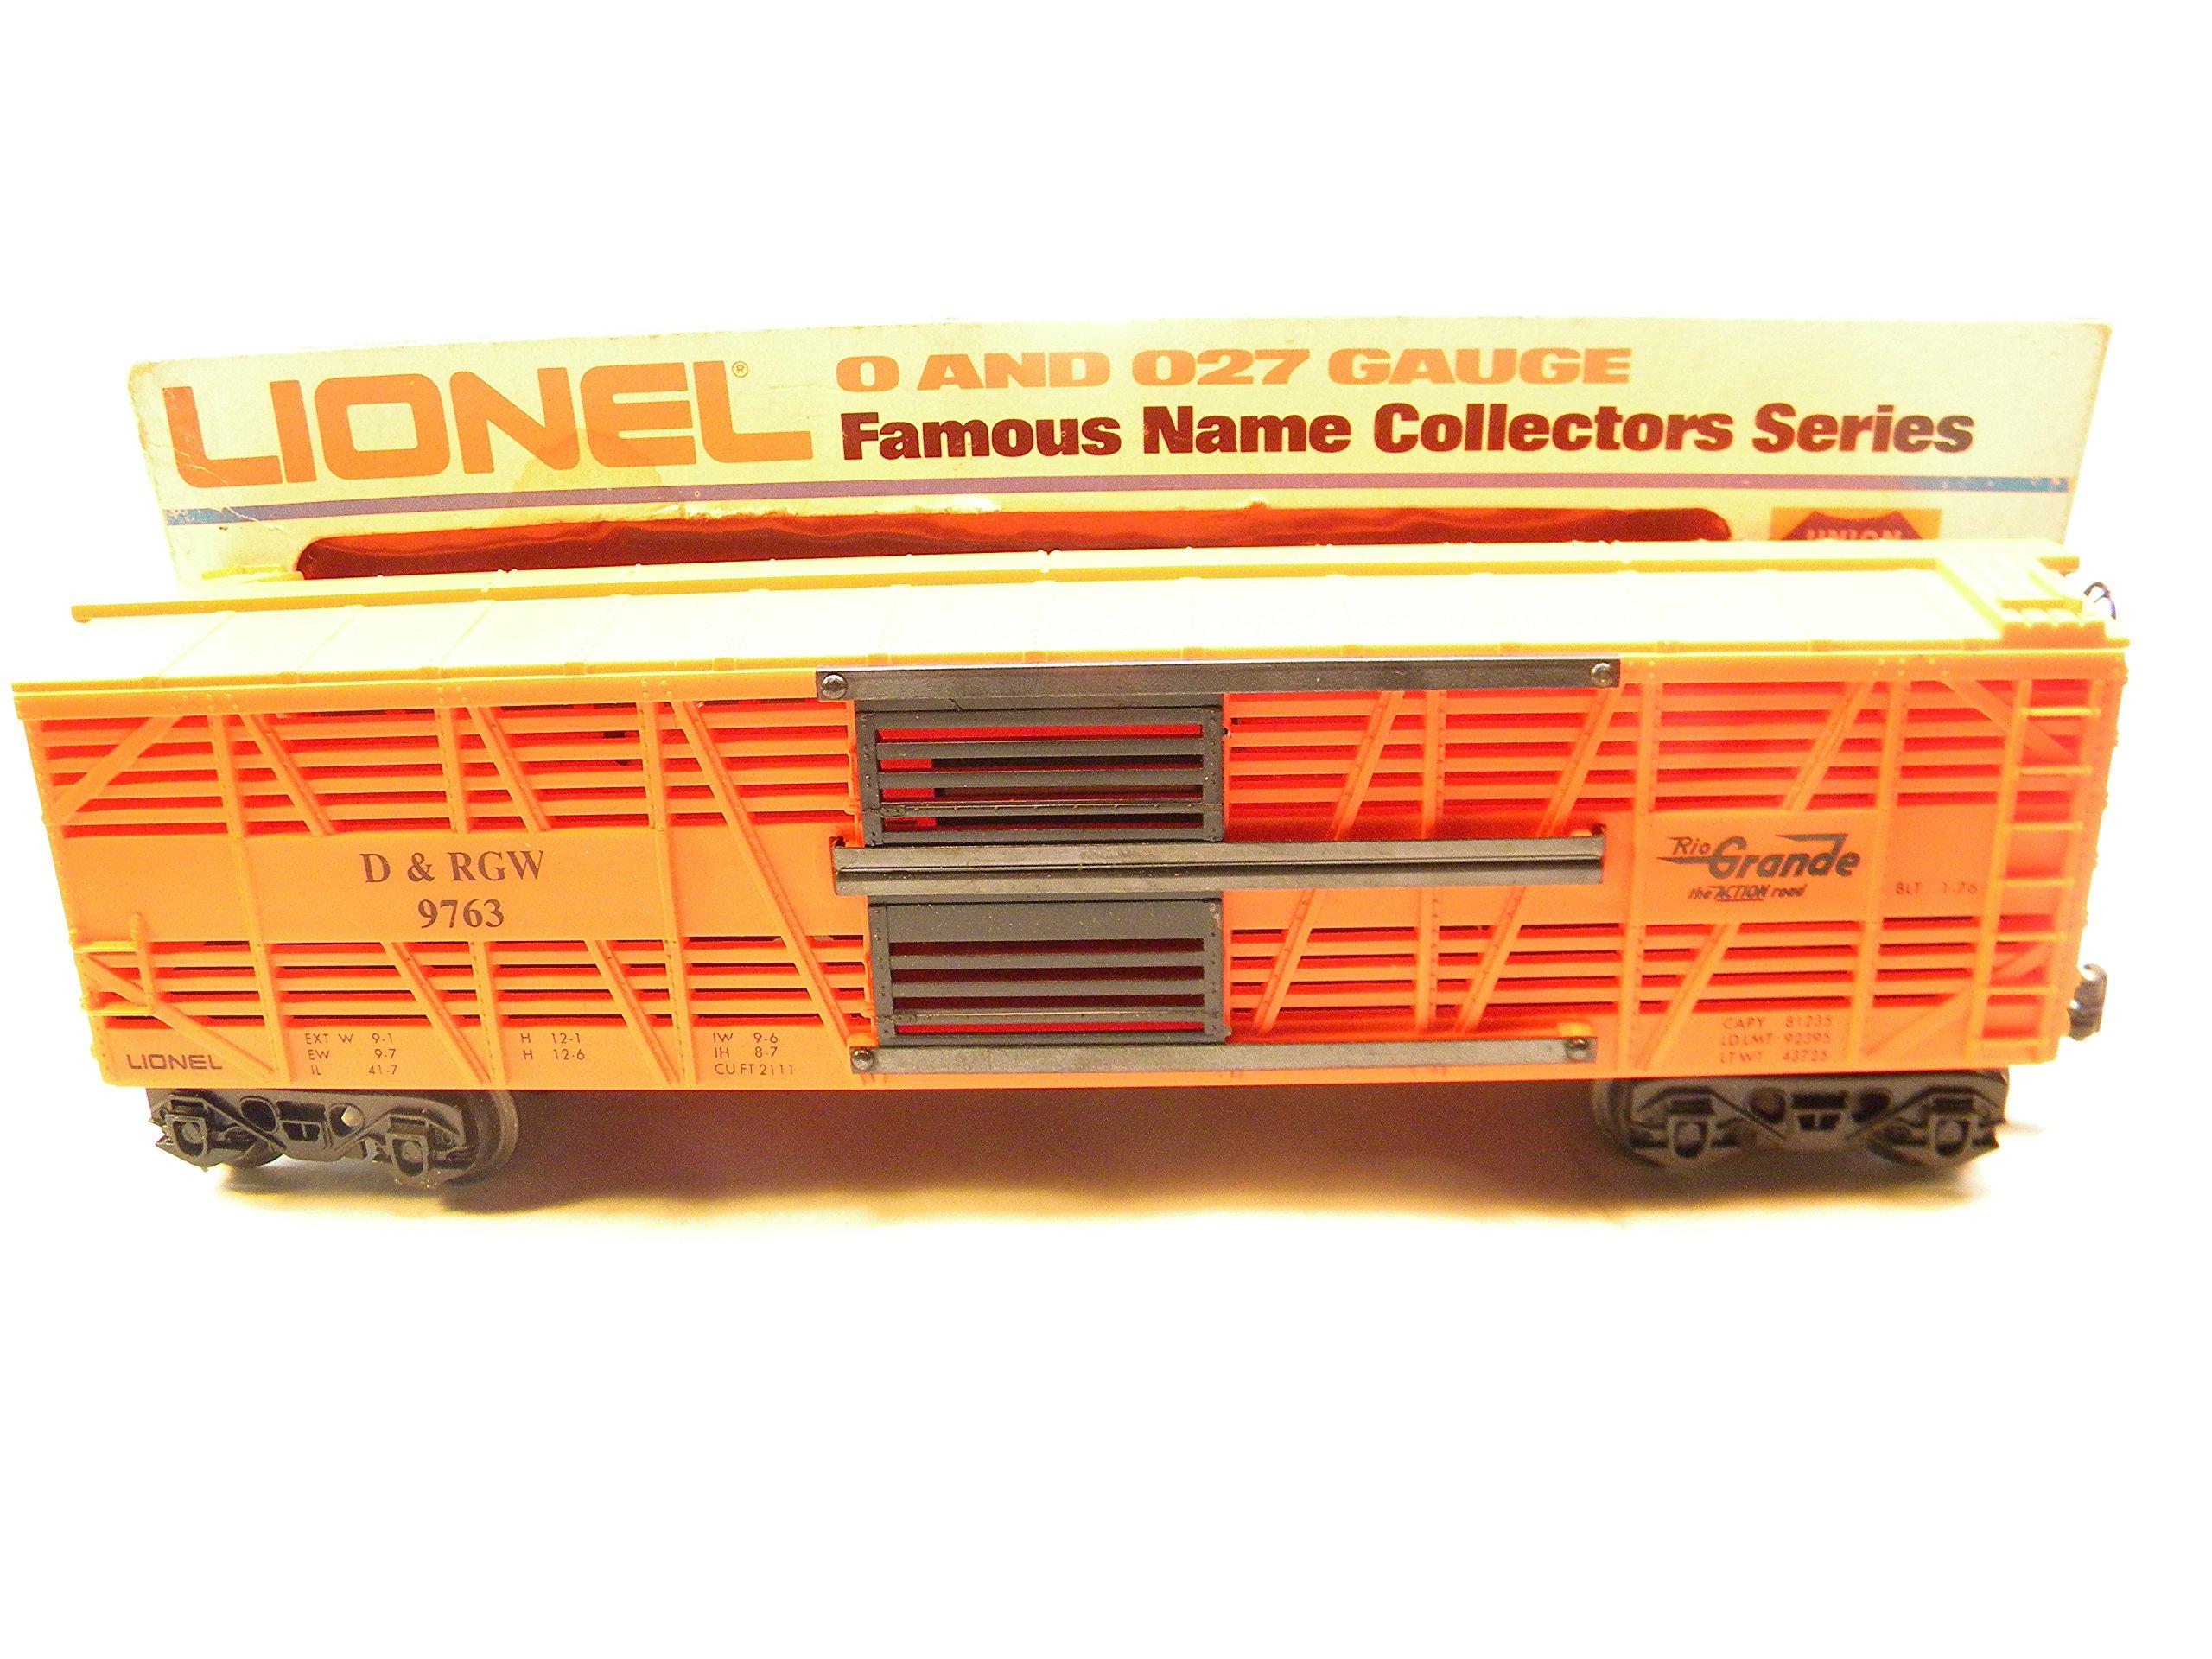 Lionel 9763 D&RGW Rio Grande Double Decker Stock Car